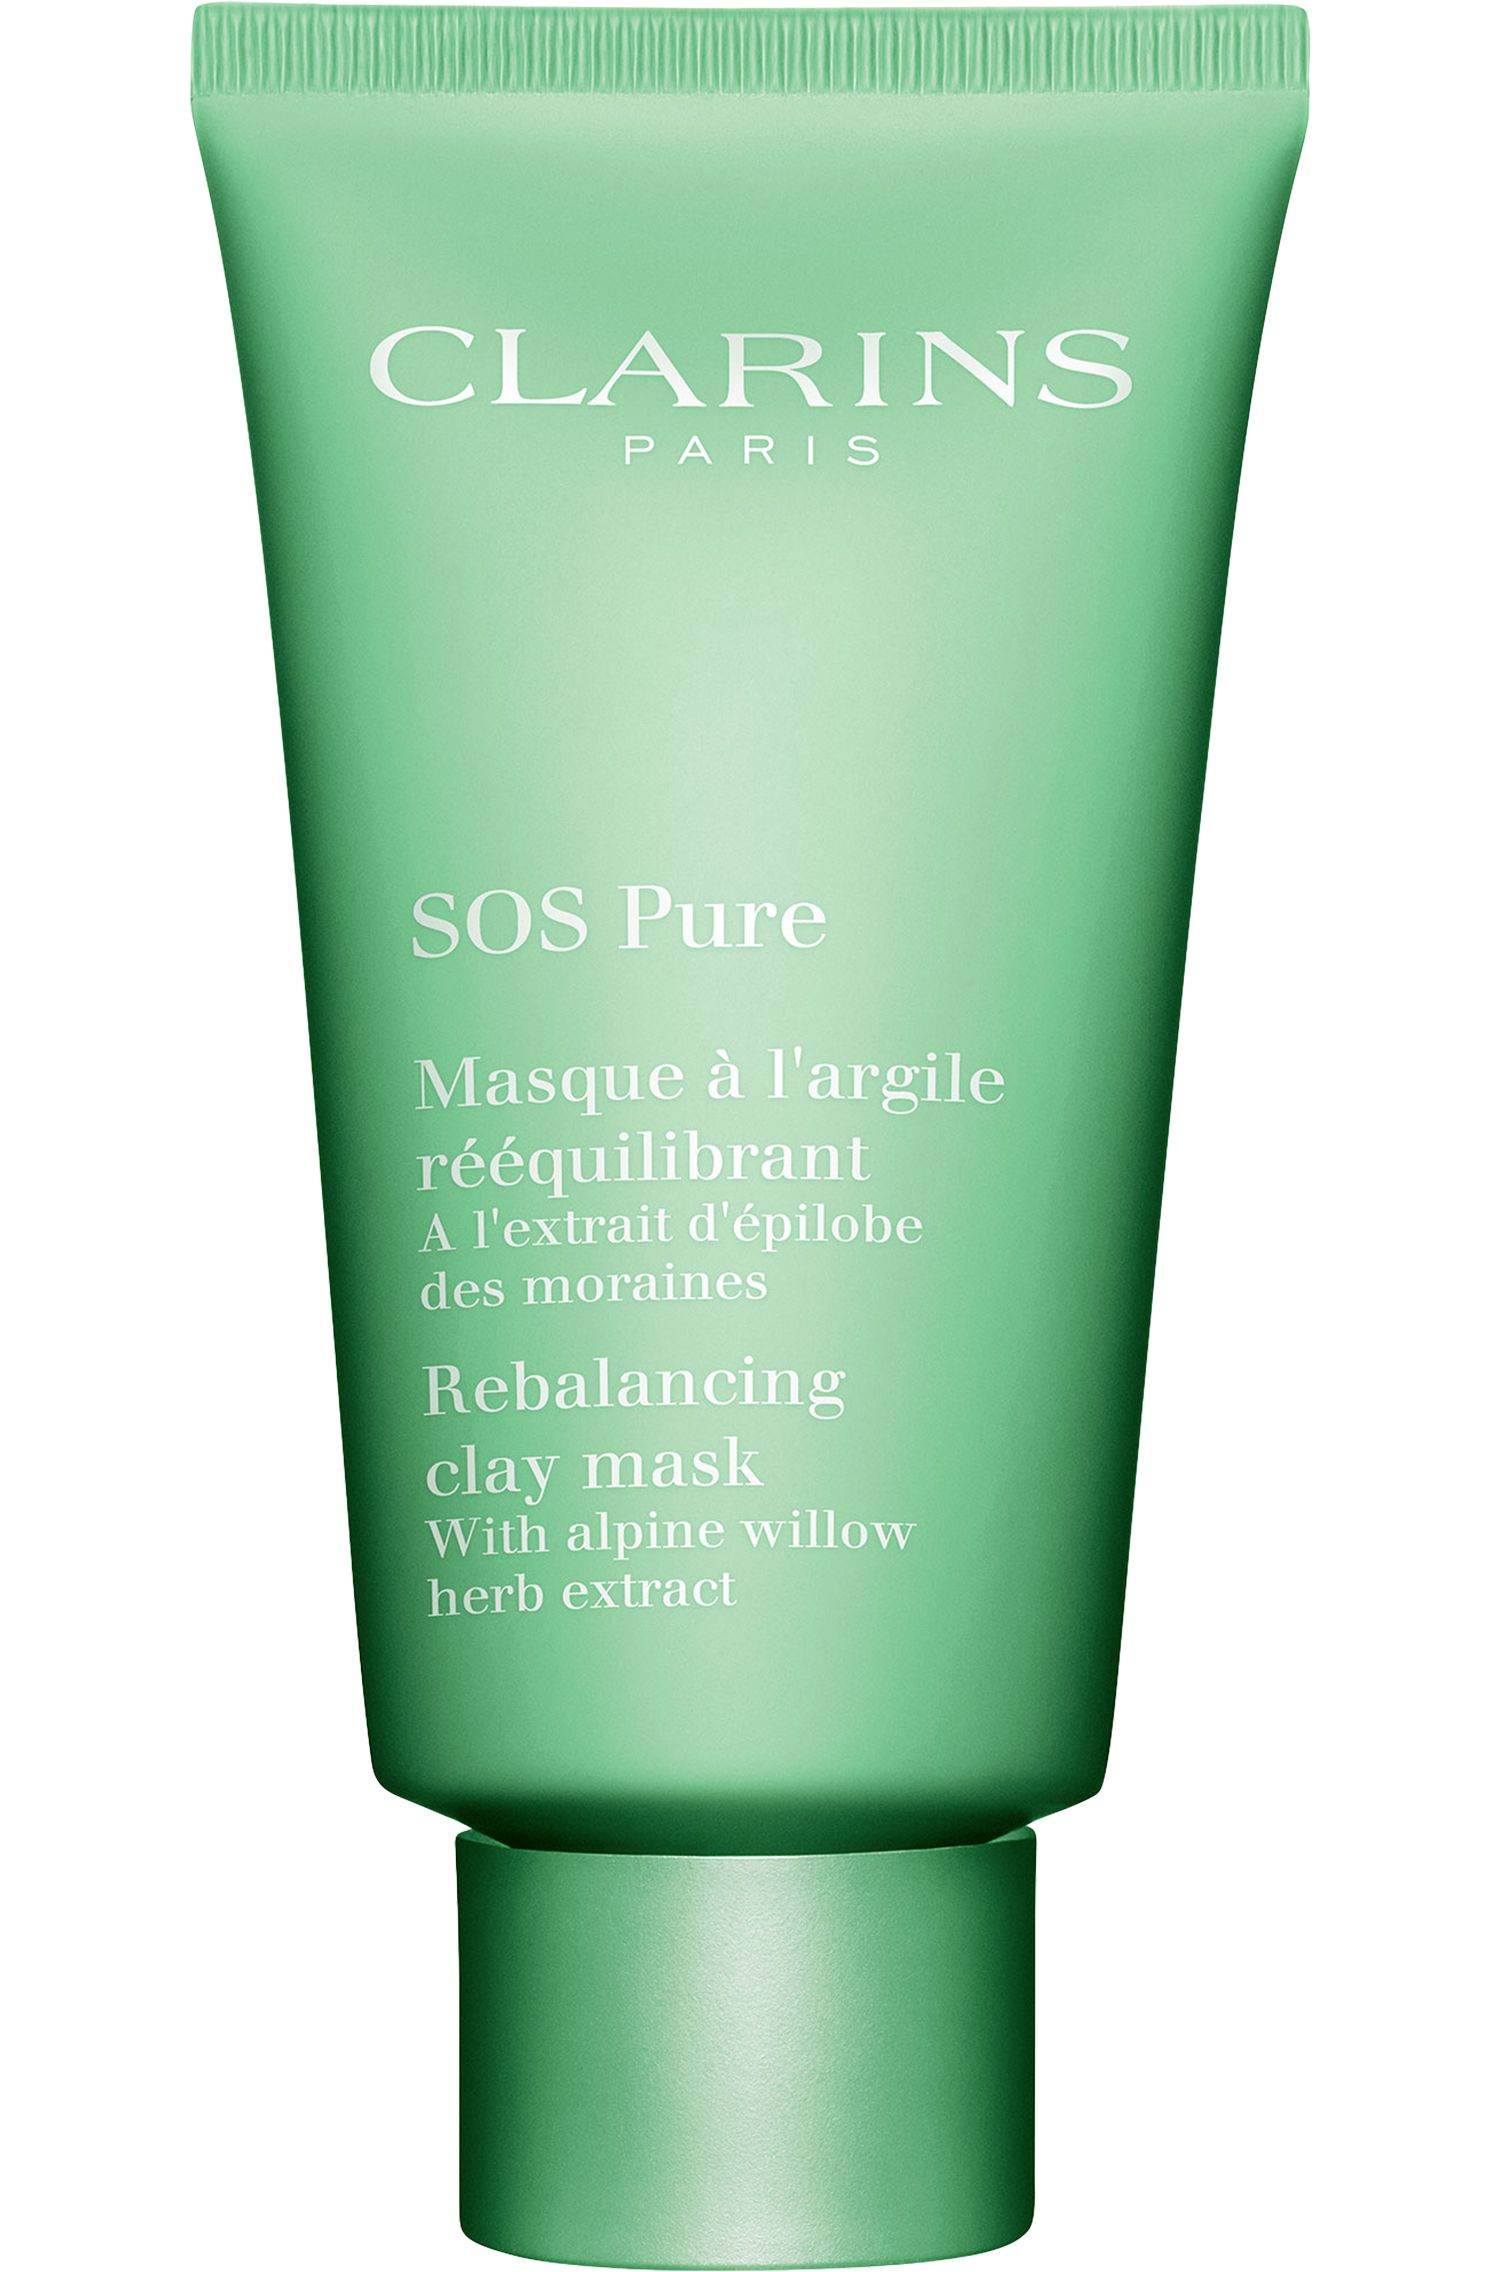 Blissim : Clarins - Masque à l'argile rééquilibrant SOS Pure - Masque à l'argile rééquilibrant SOS Pure